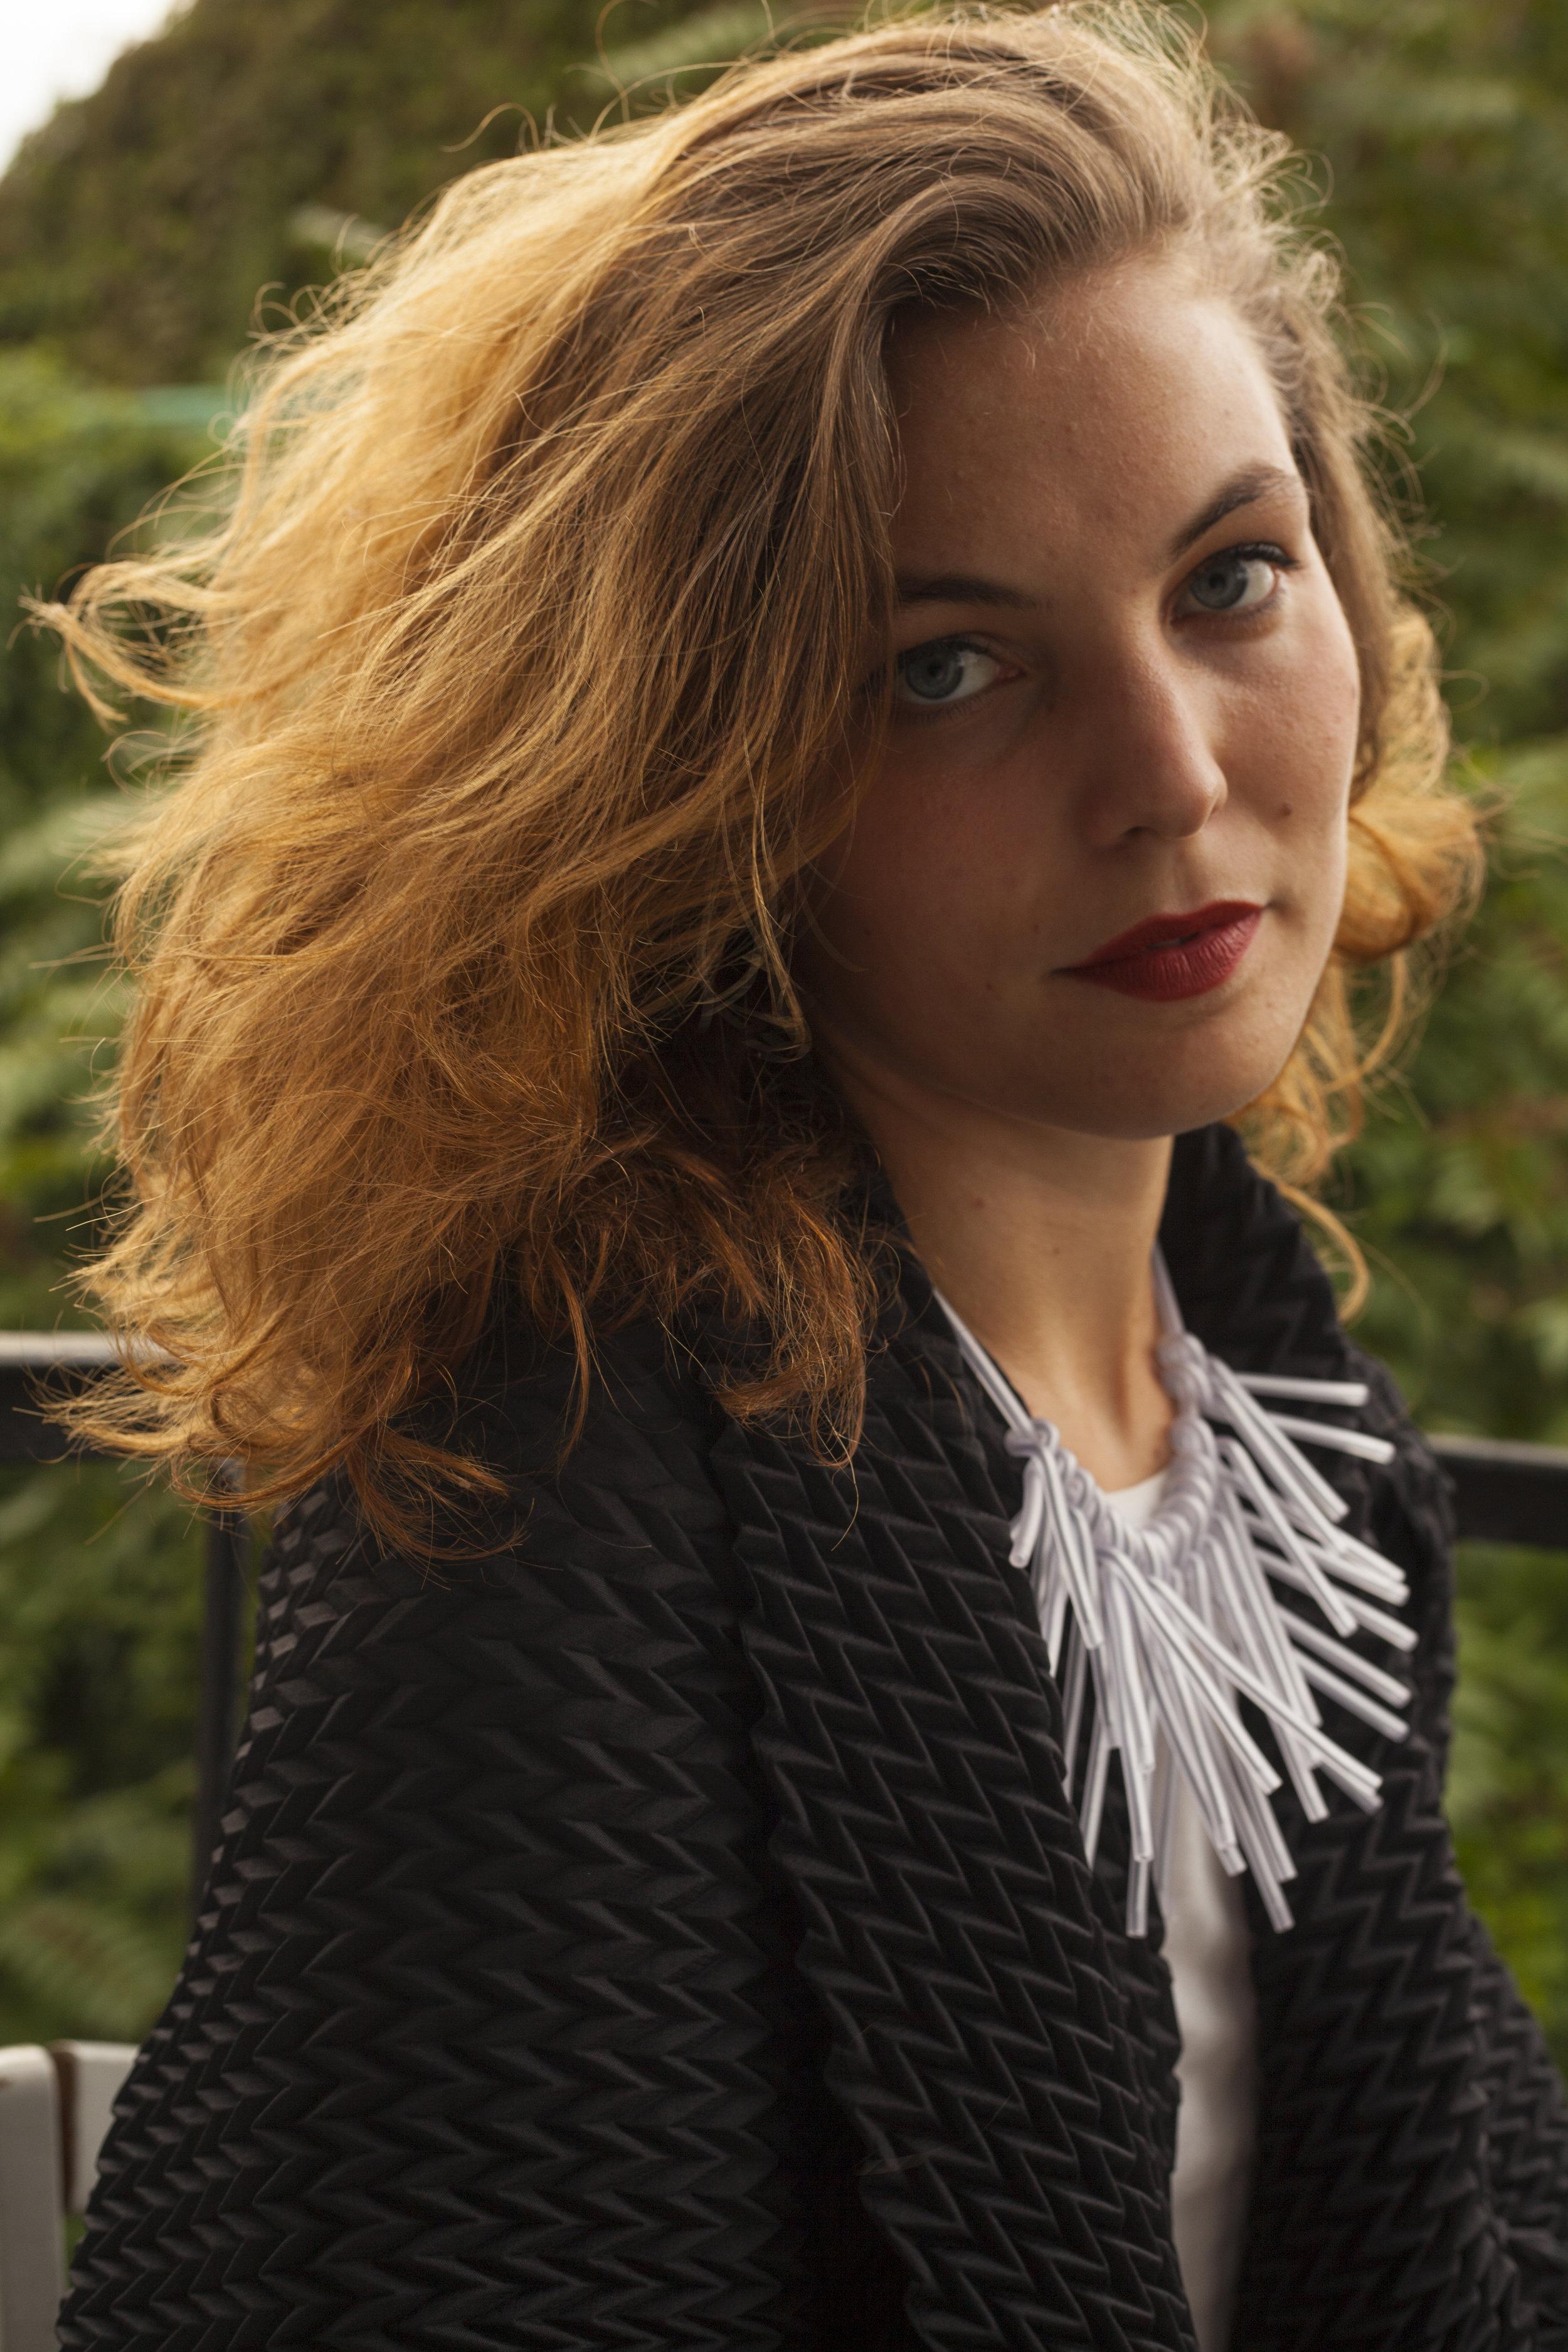 Eleonora_volpe0918.JPG